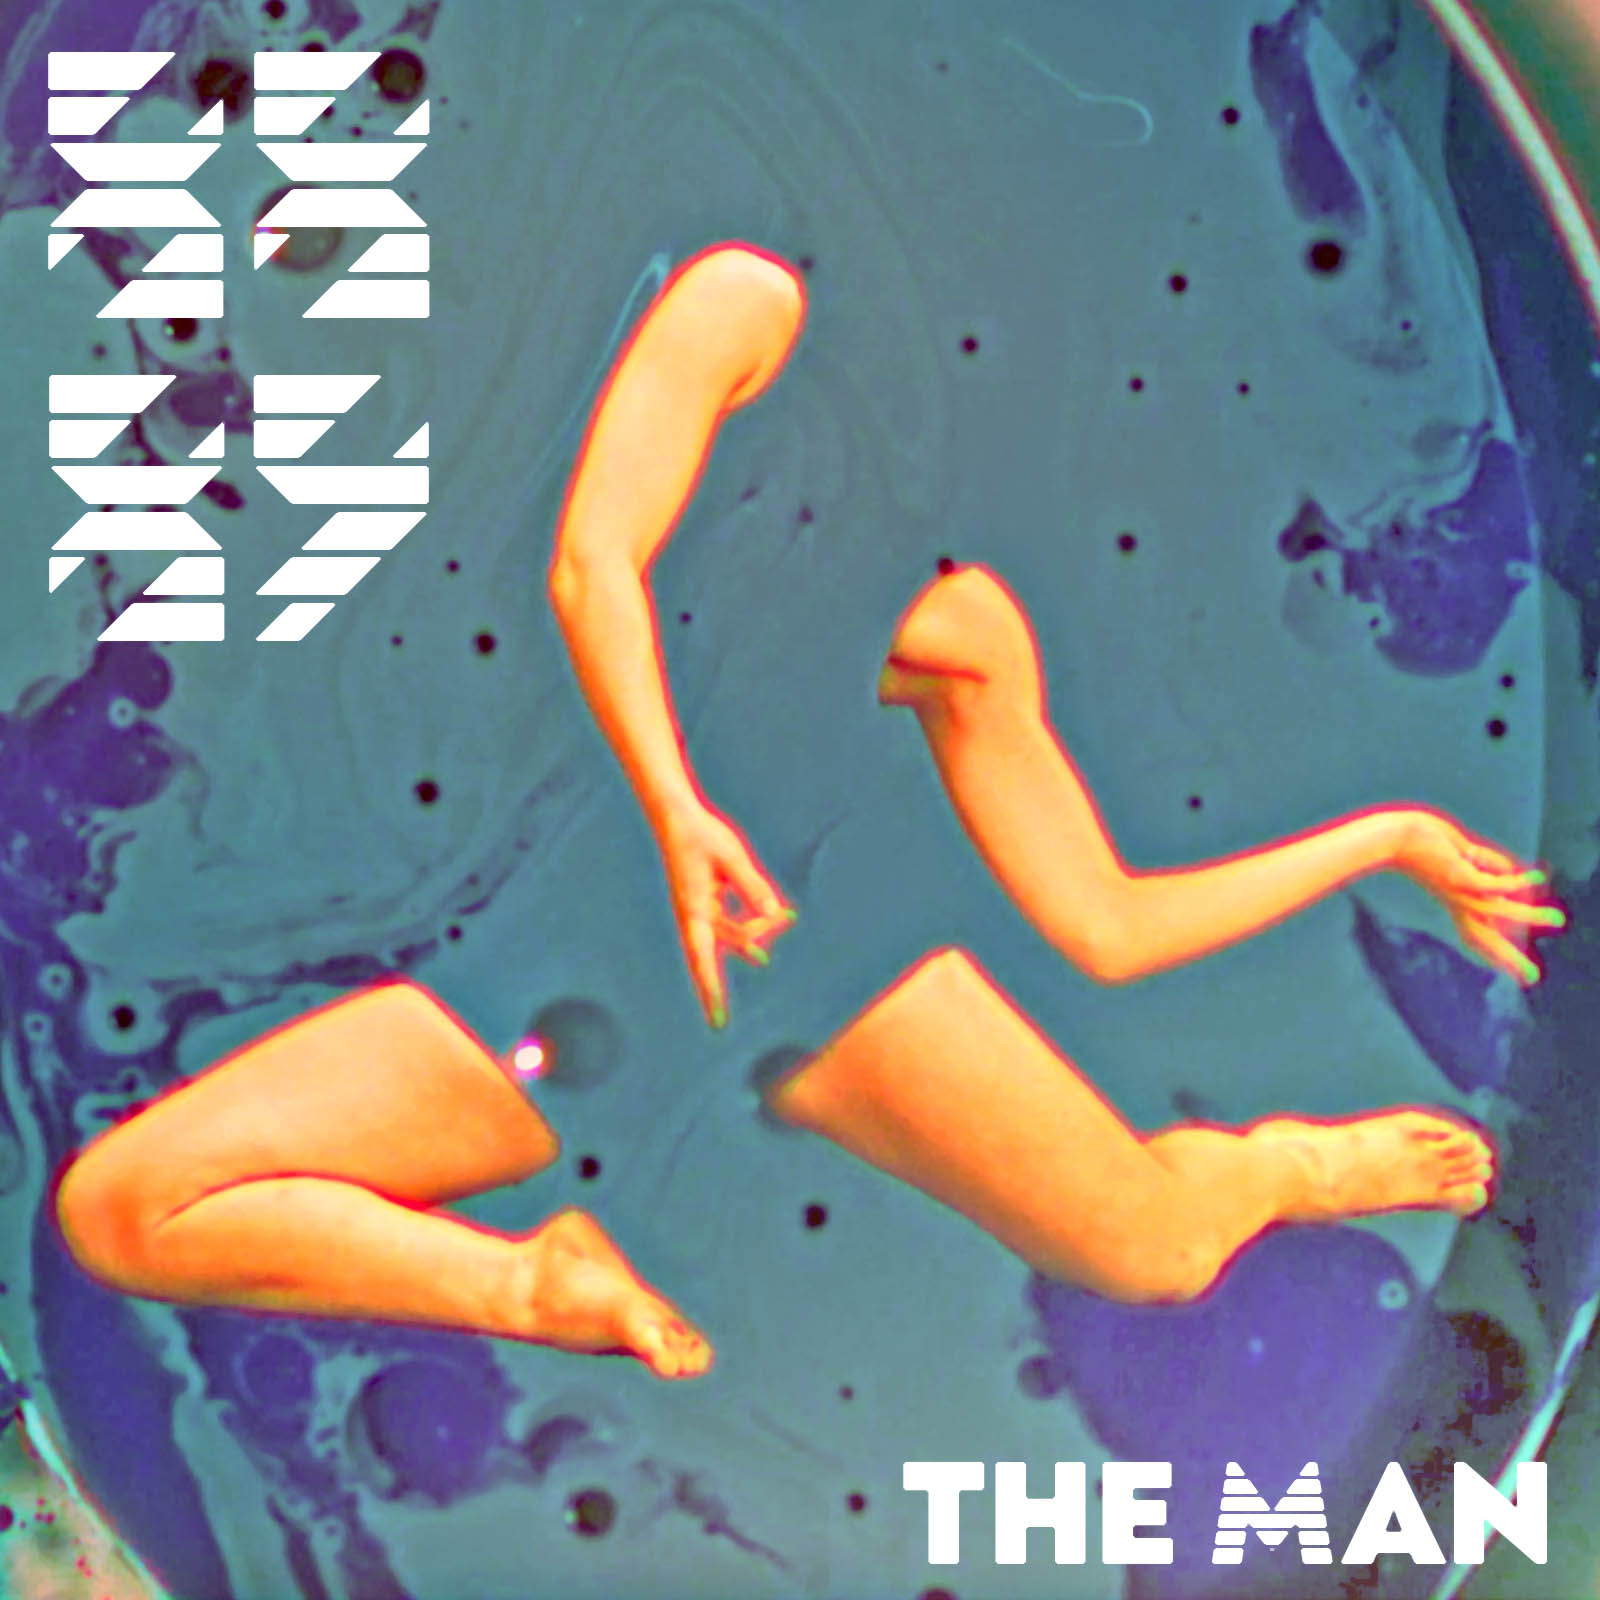 The Man - 88-89